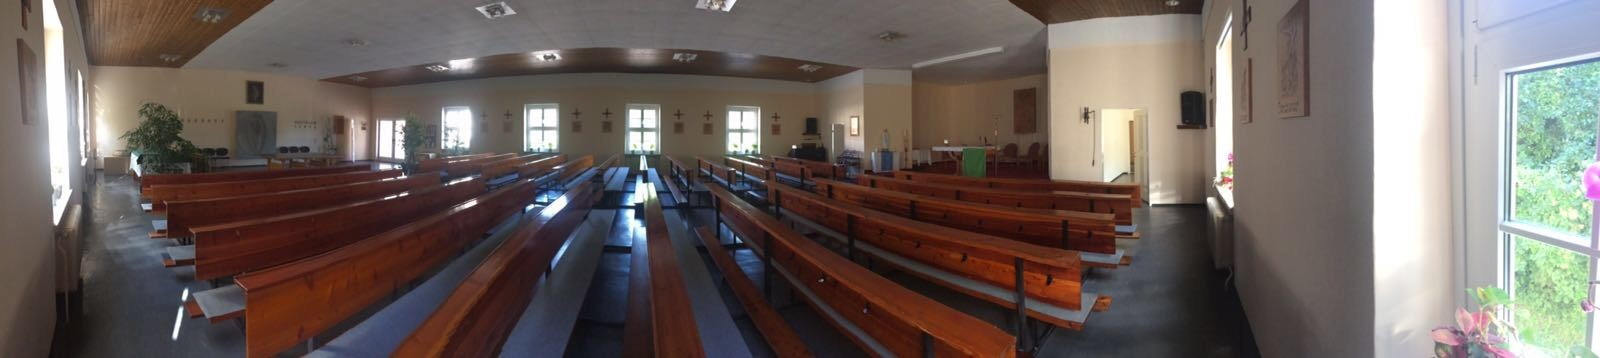 erzdiözese salzburg ordinariat